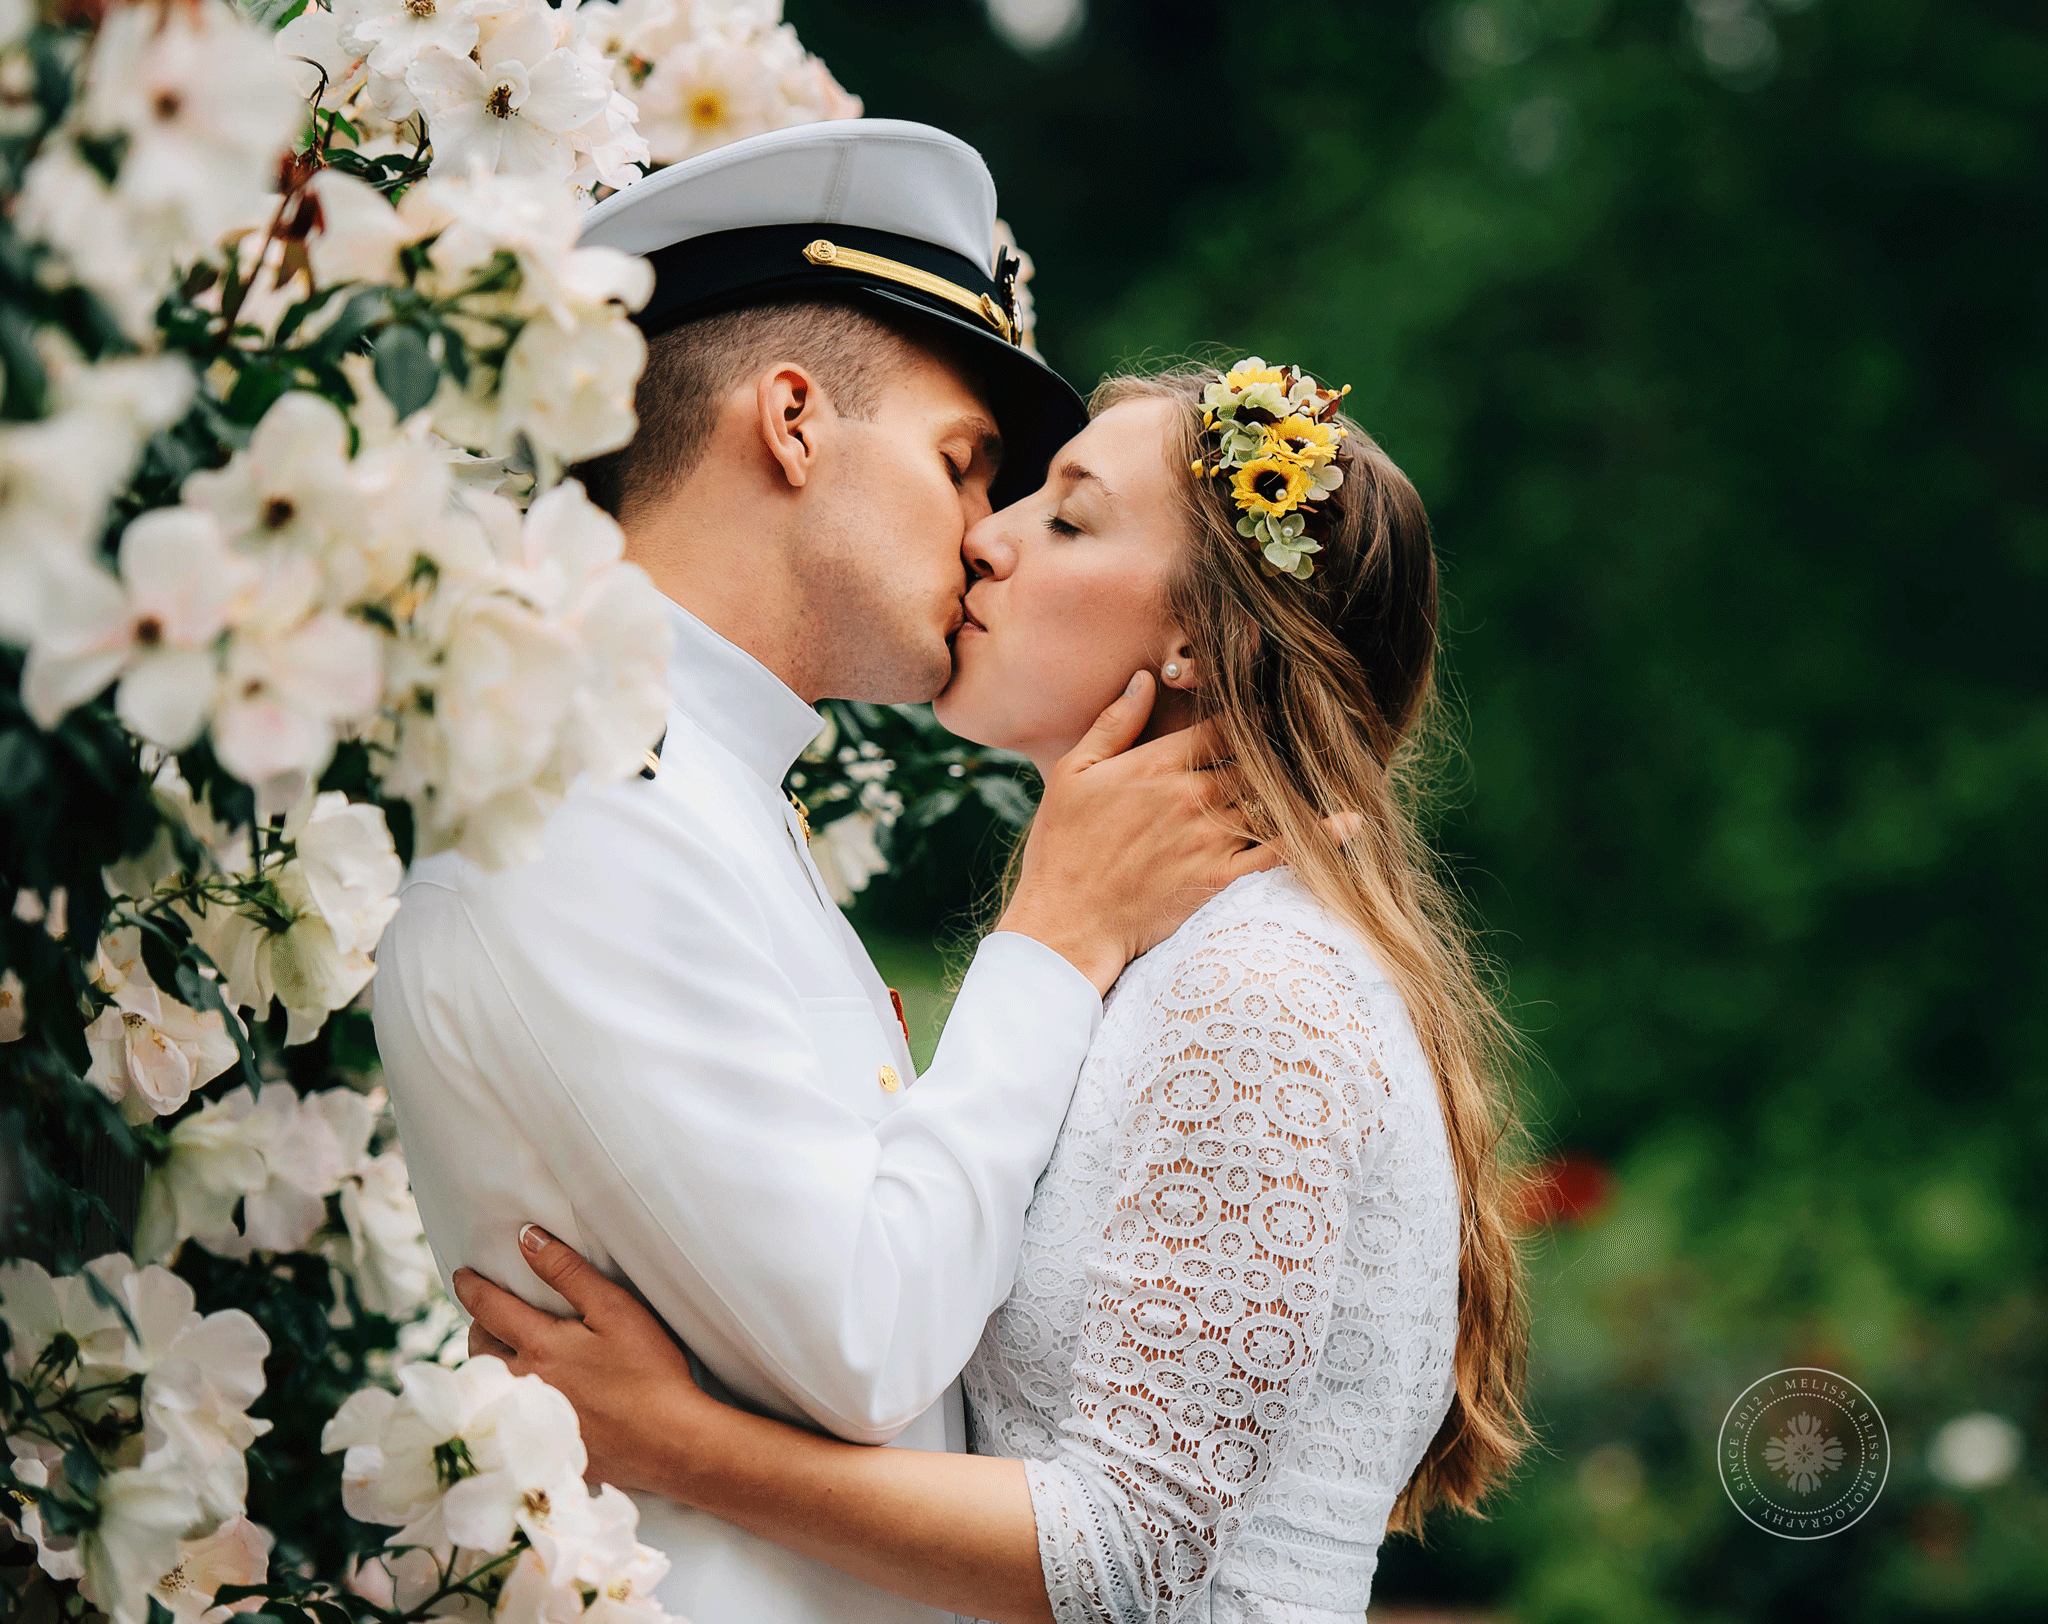 norfolk-botanical-garden-weddings-melissa-bliss-photography-virginia-beach-norfolk-porstmouth-chesapeake-professional-weddingp-photography-bride-and-groom-portraits